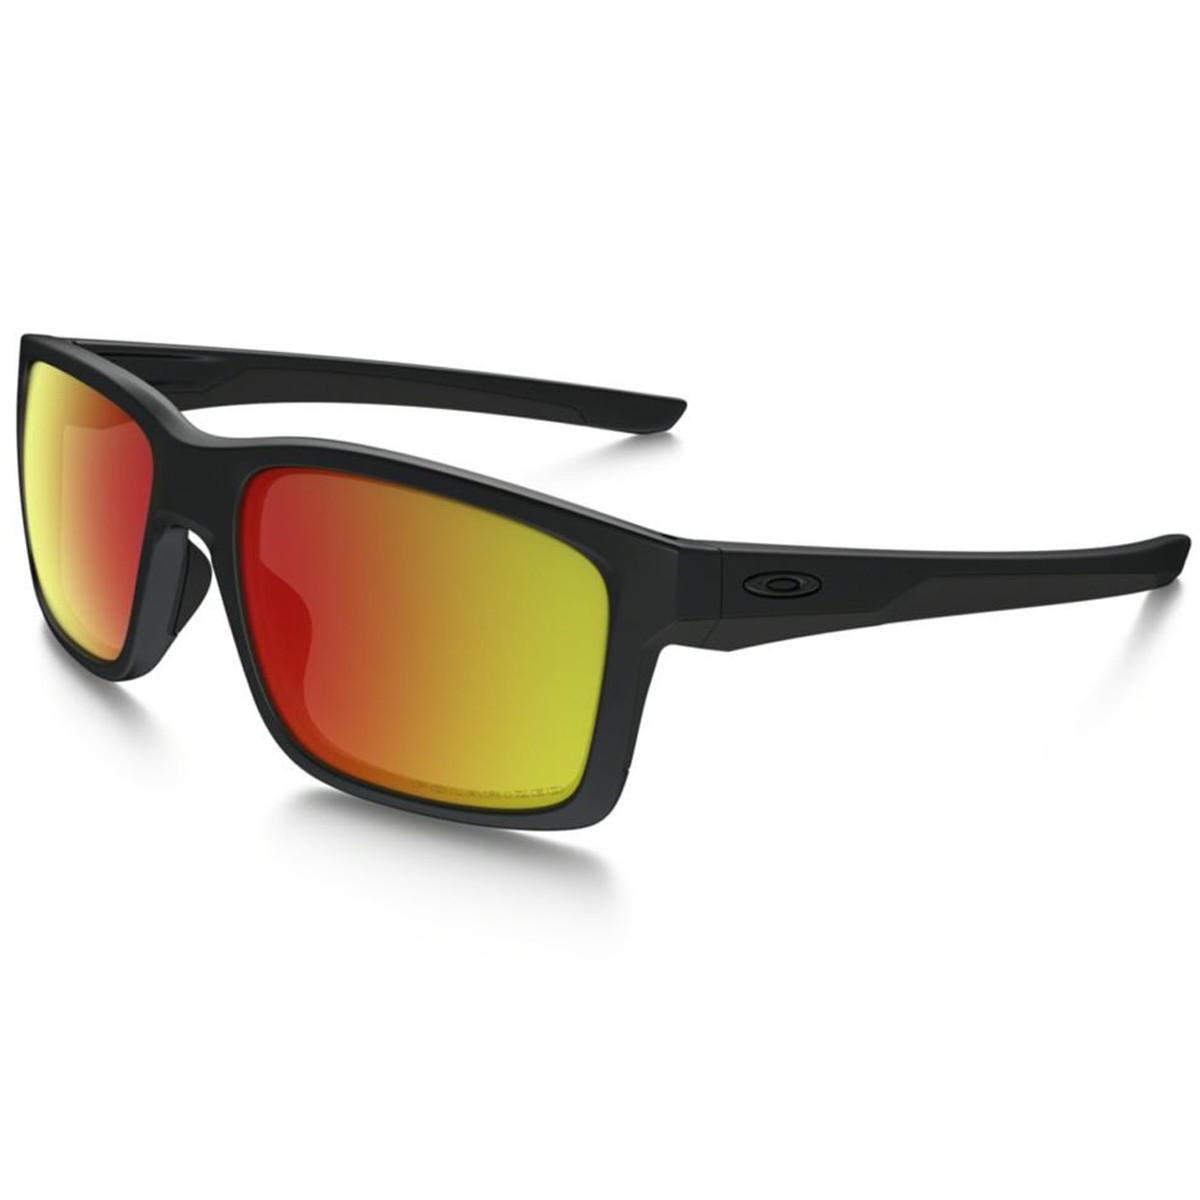 7d25eead51564 Óculos Oakley Mainlink Matte Black  Lente Ruby Iridium Polarizado ...